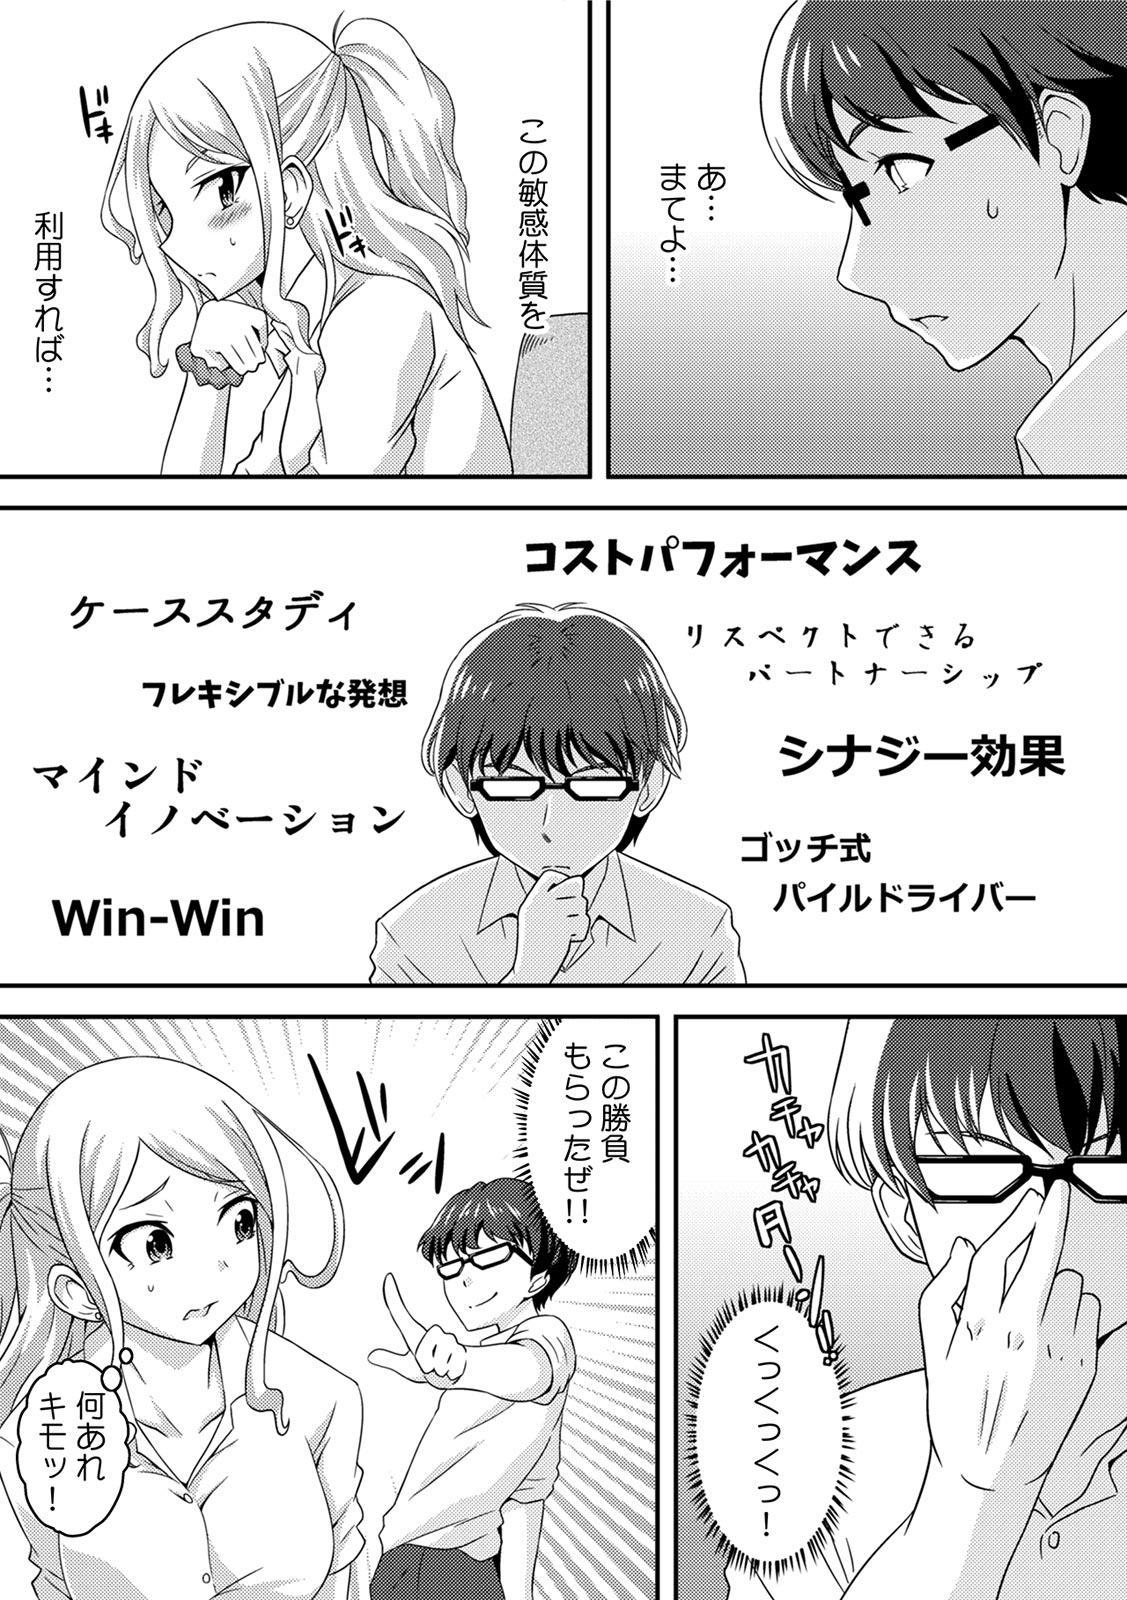 [Yuzu Ramune] Yankee Musume o Ecchi de Kousei!? ~Jugyou de Ijirare Shitagi ga Gusshori~ 1 8